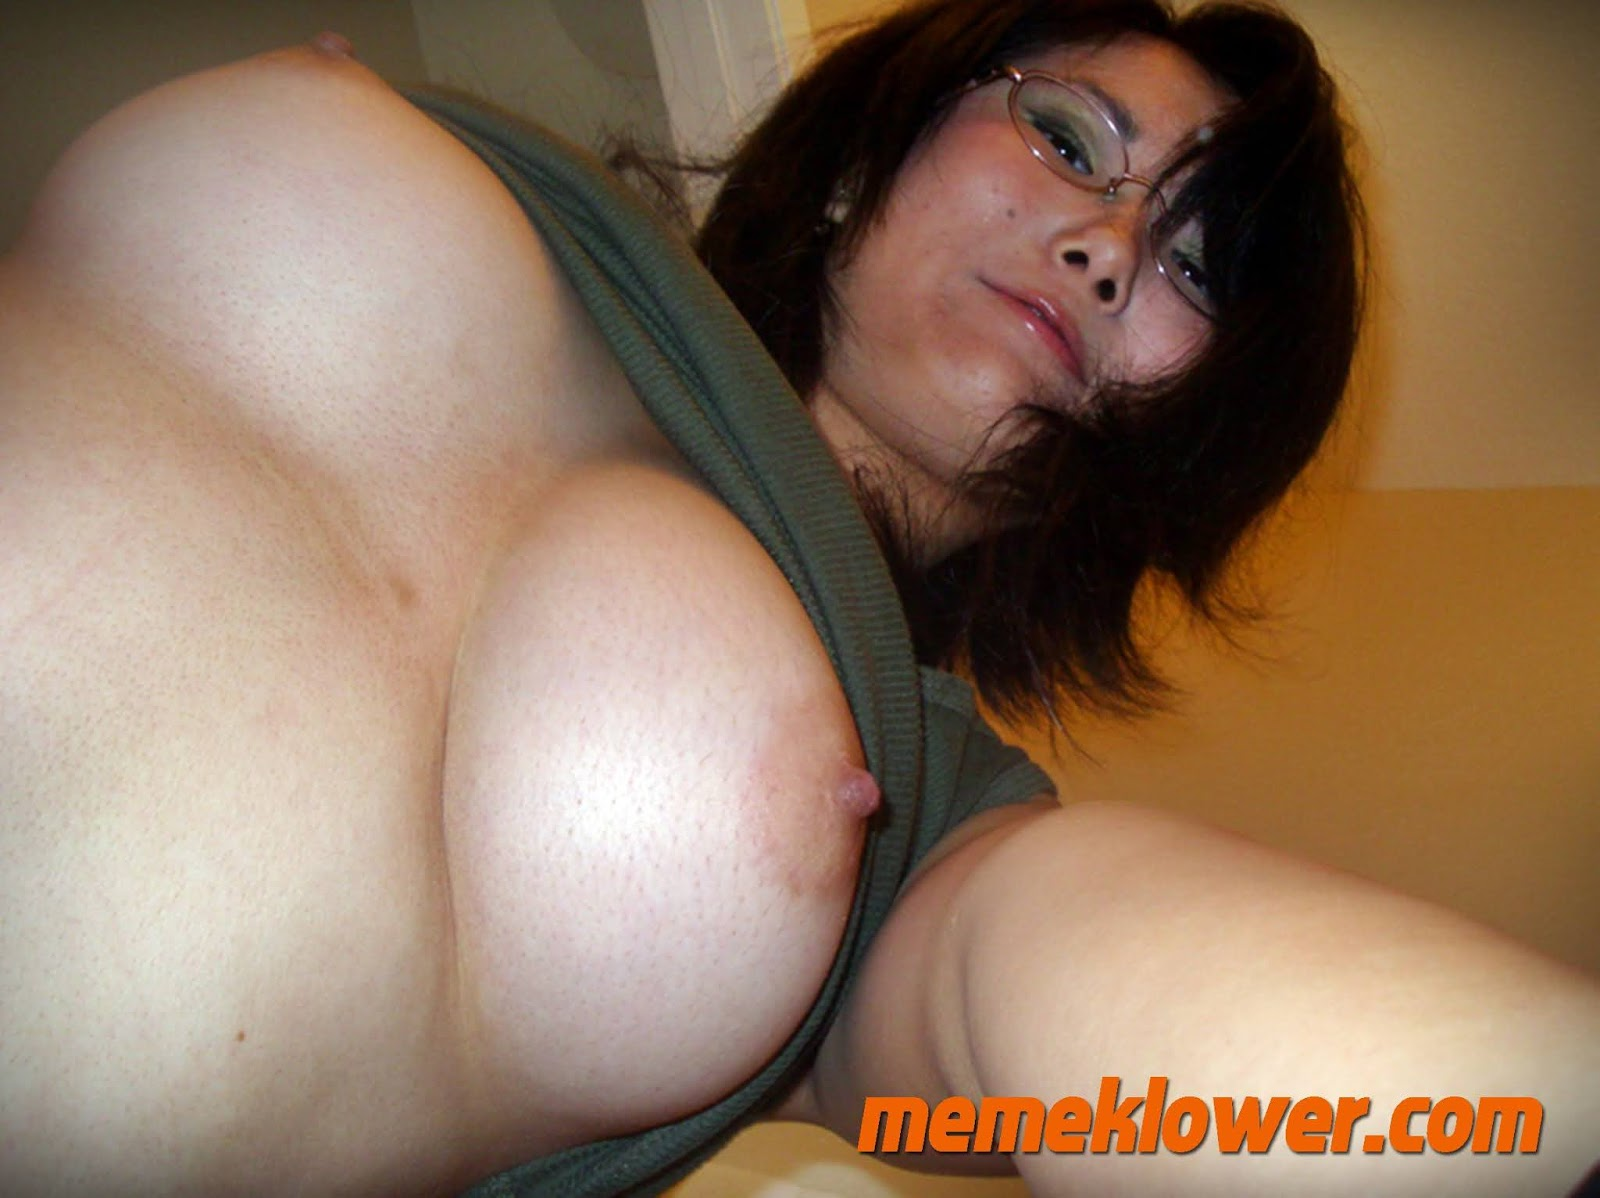 foto-bugil-tante-cantik-janda-bohay-1